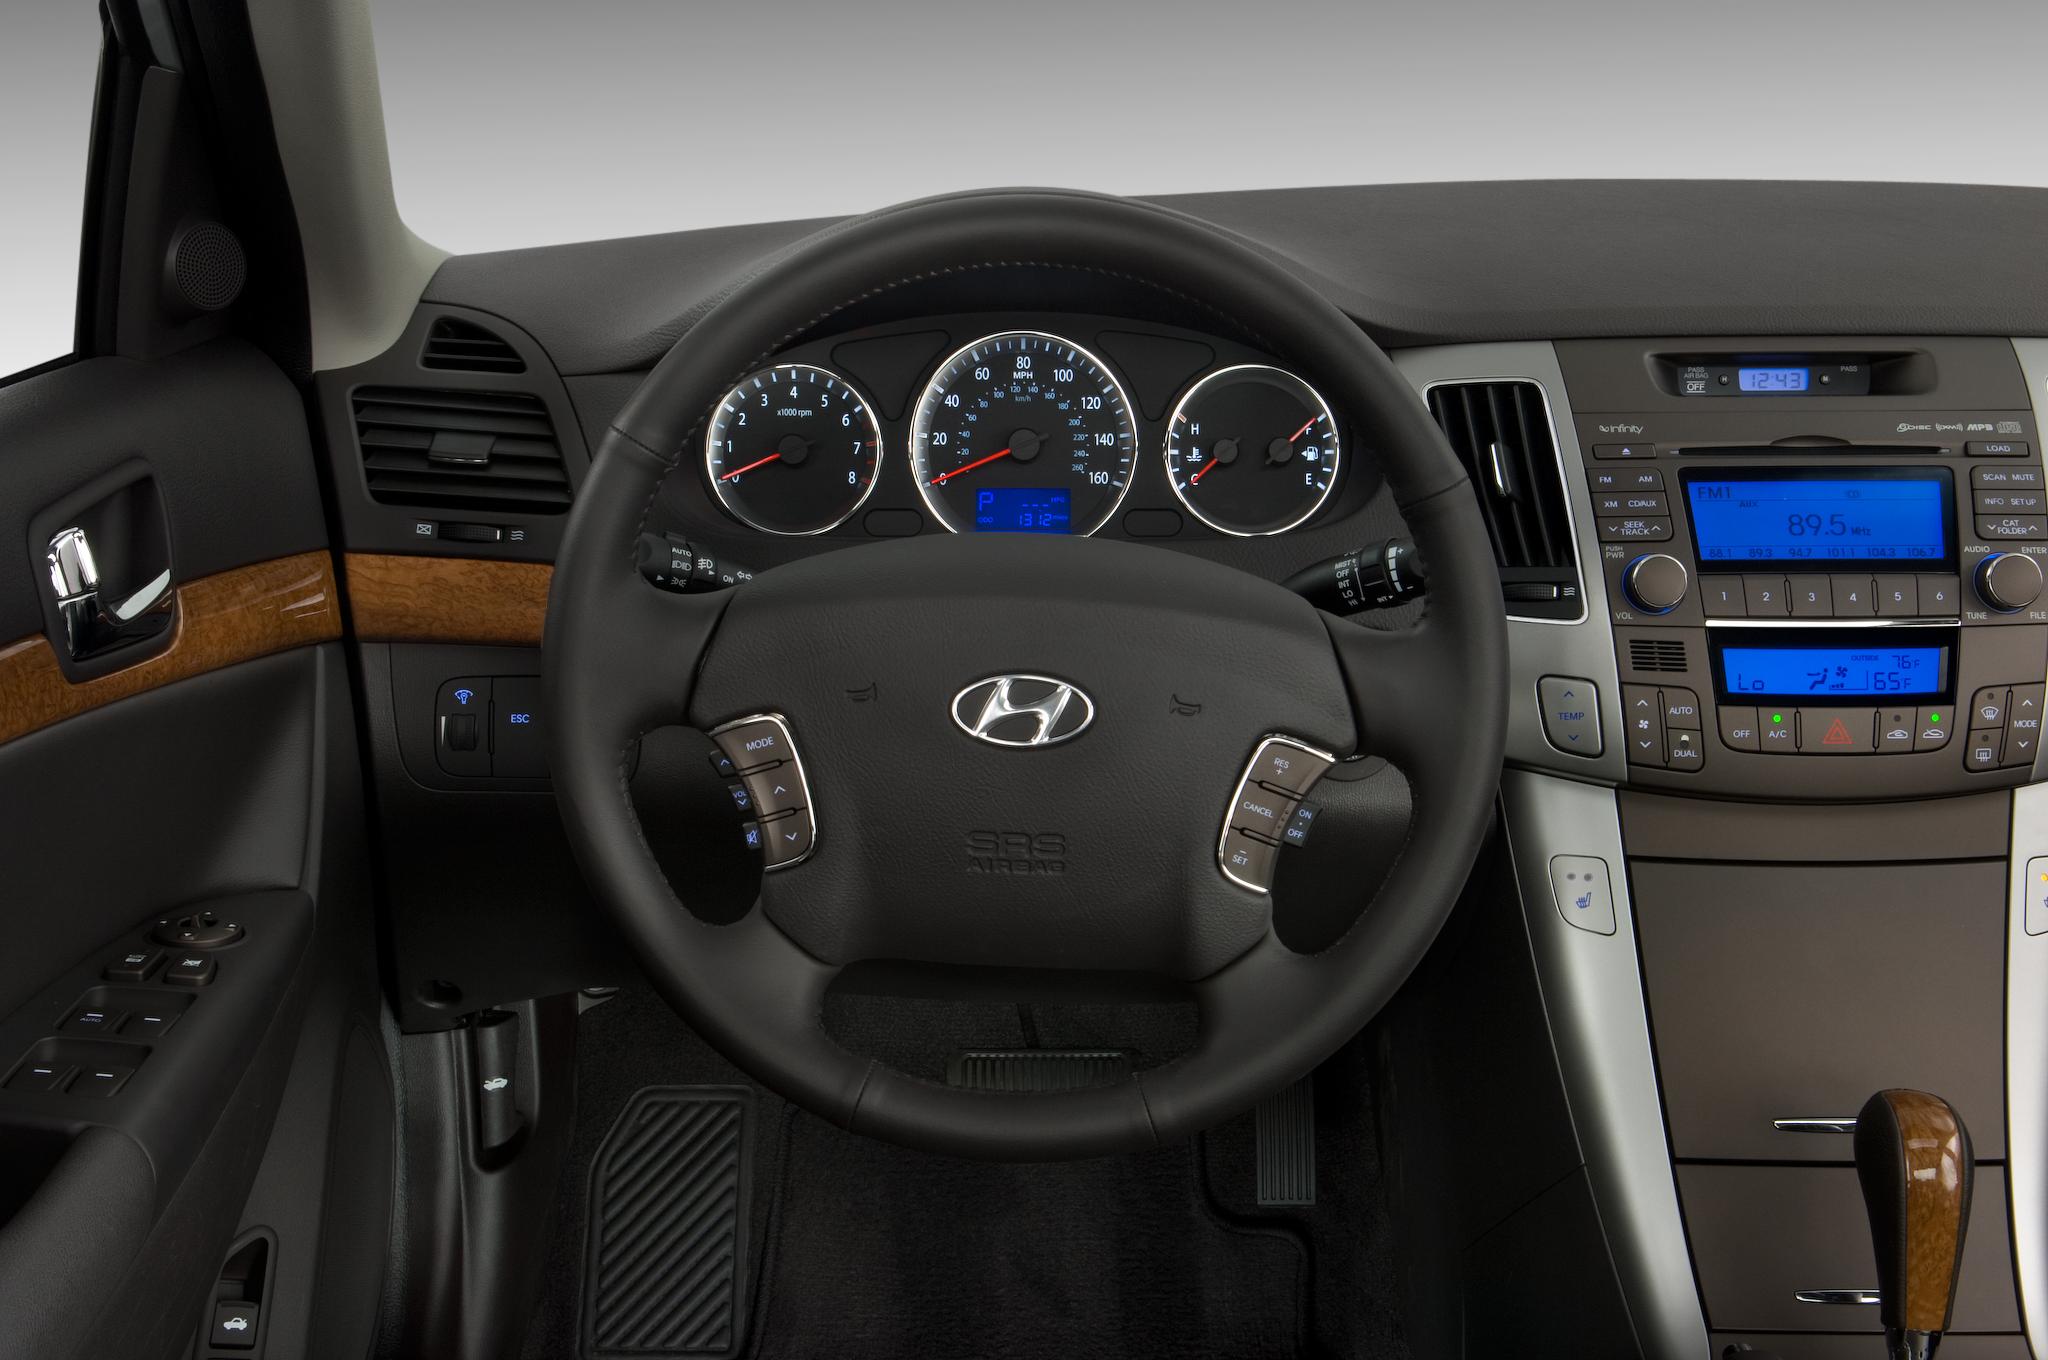 2010 Hyundai Sonata Se Hyundai Midsize Sedan Review Automobile